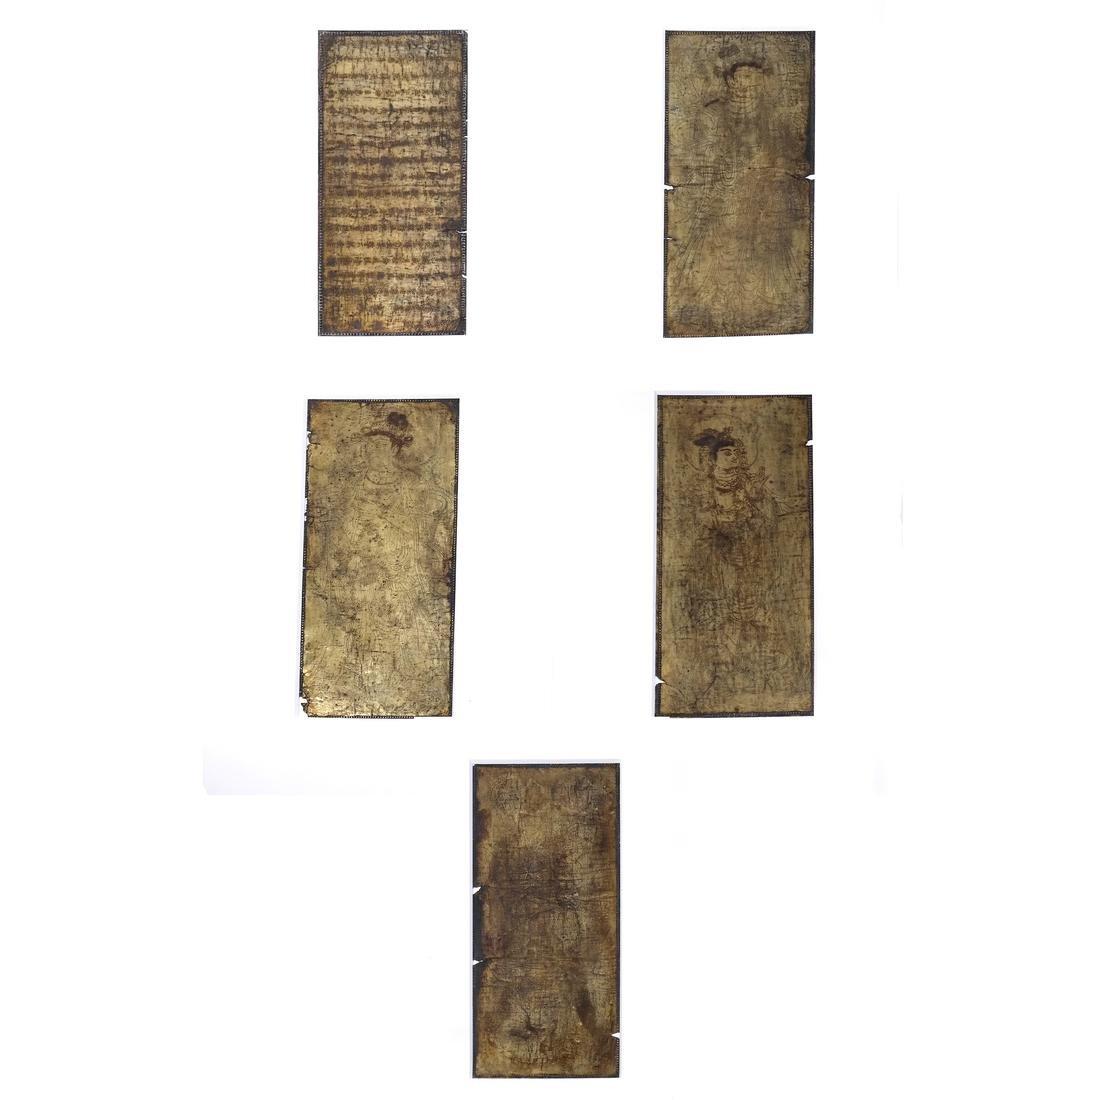 5 ASIAN GILT-SILVER RECTANGULAR MANUSCRIPT SHEETS